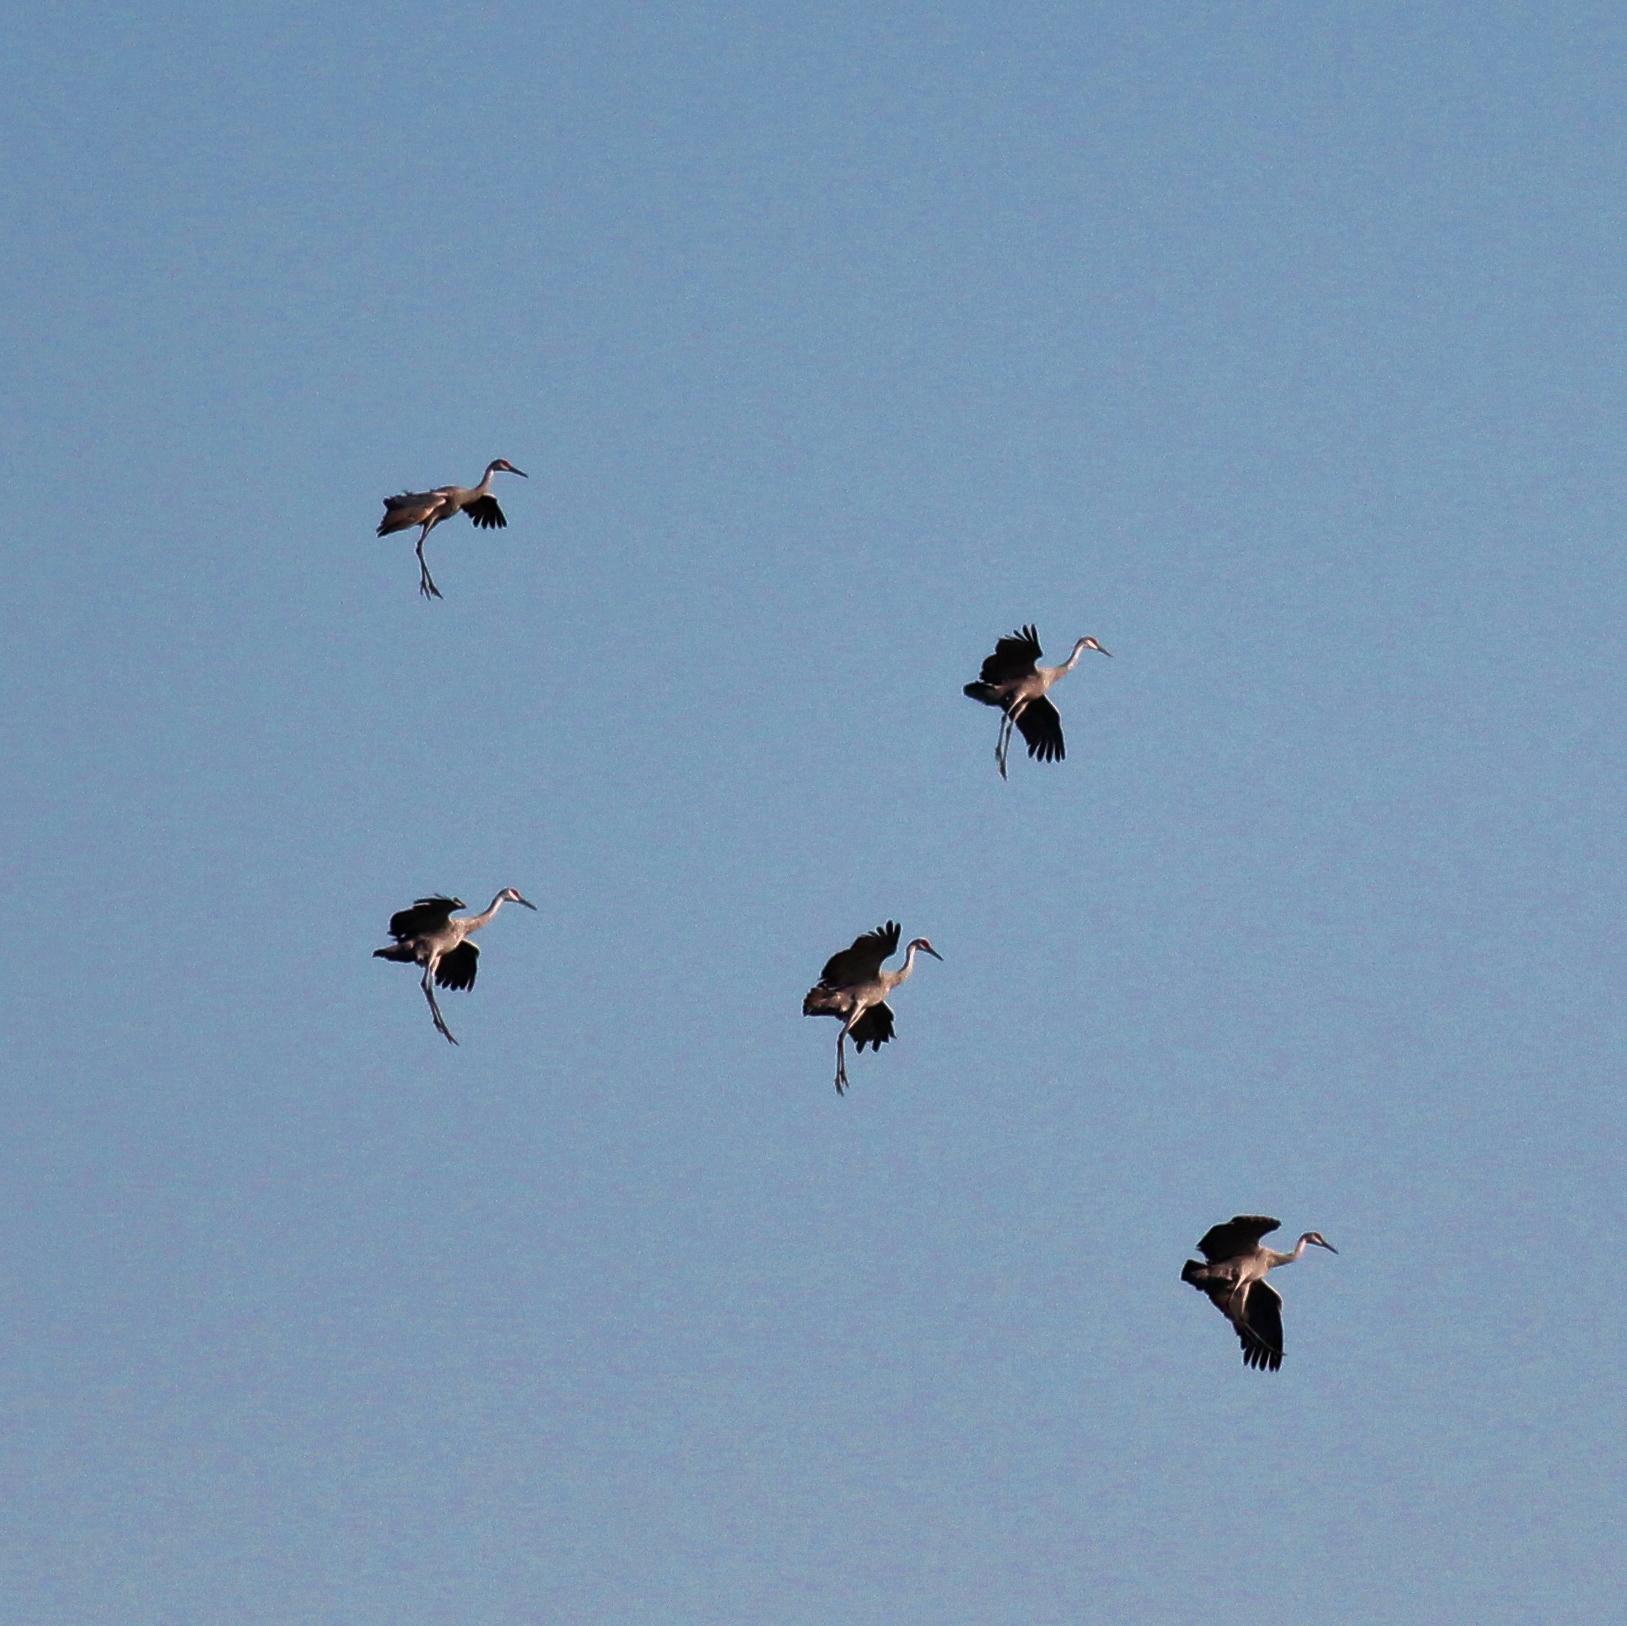 Cranes landing with legs hanging down